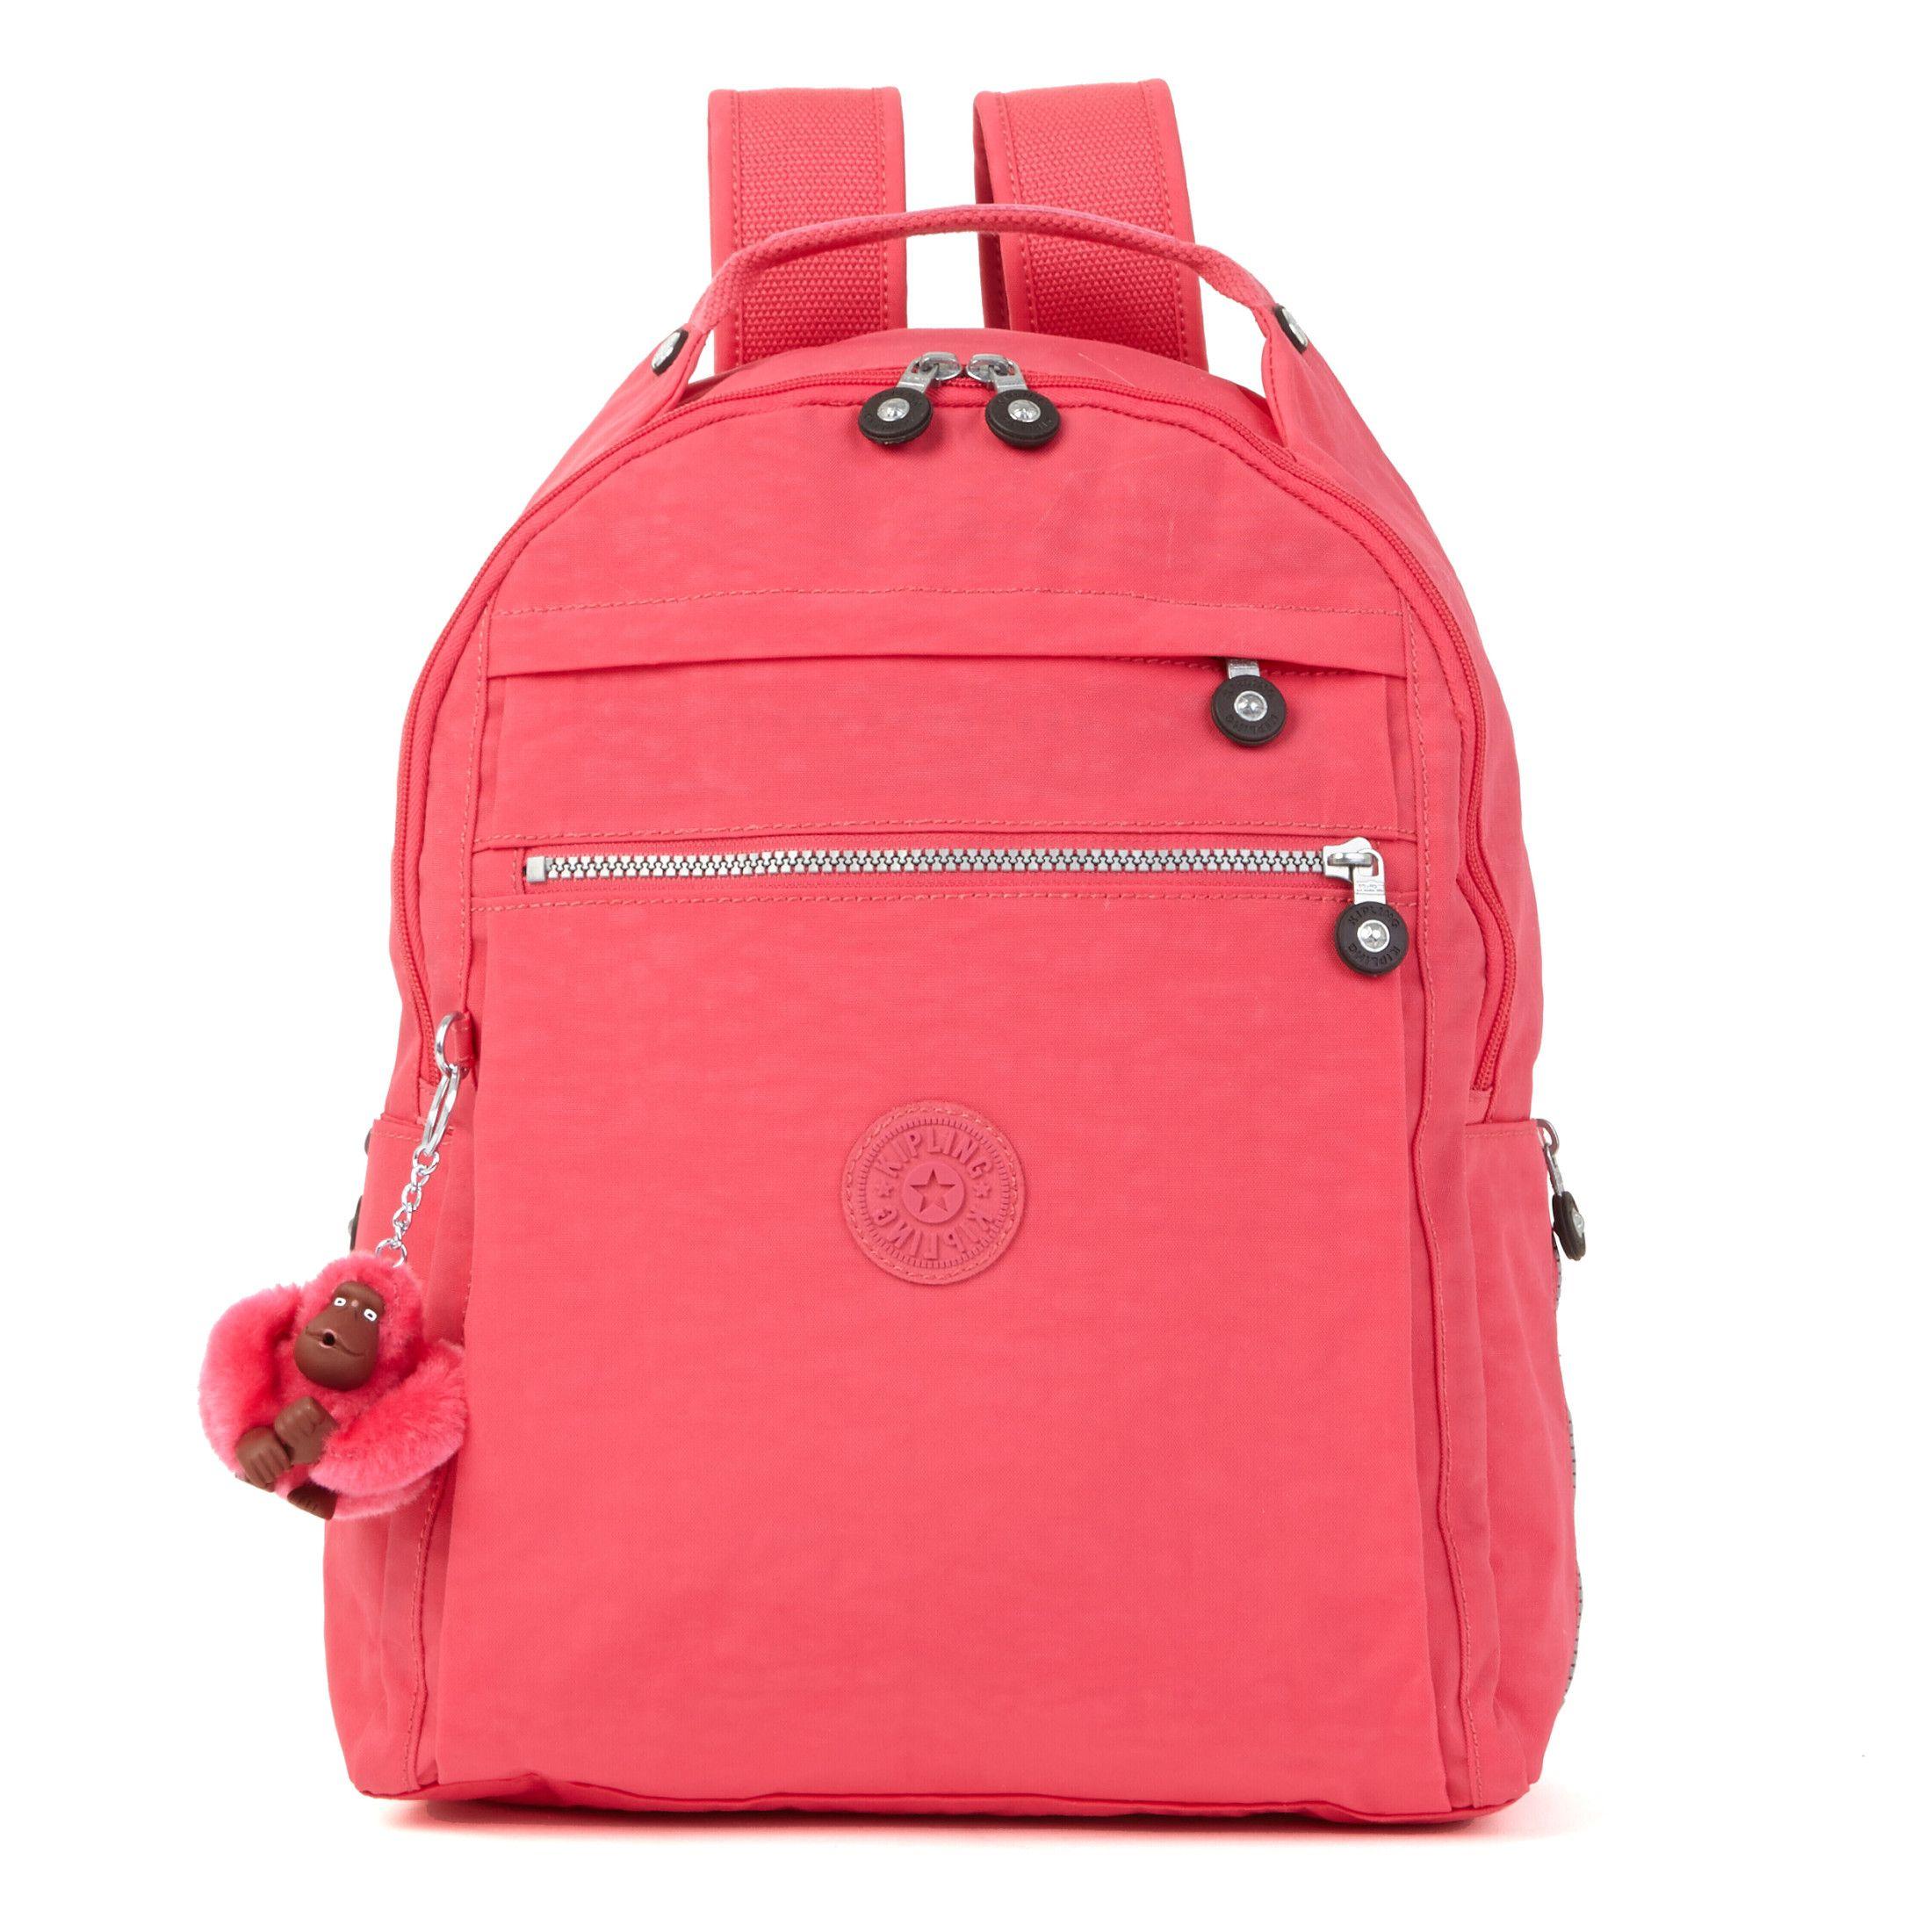 Micah Laptop Backpack - Vibrant Pink 7d6c71dbe9085